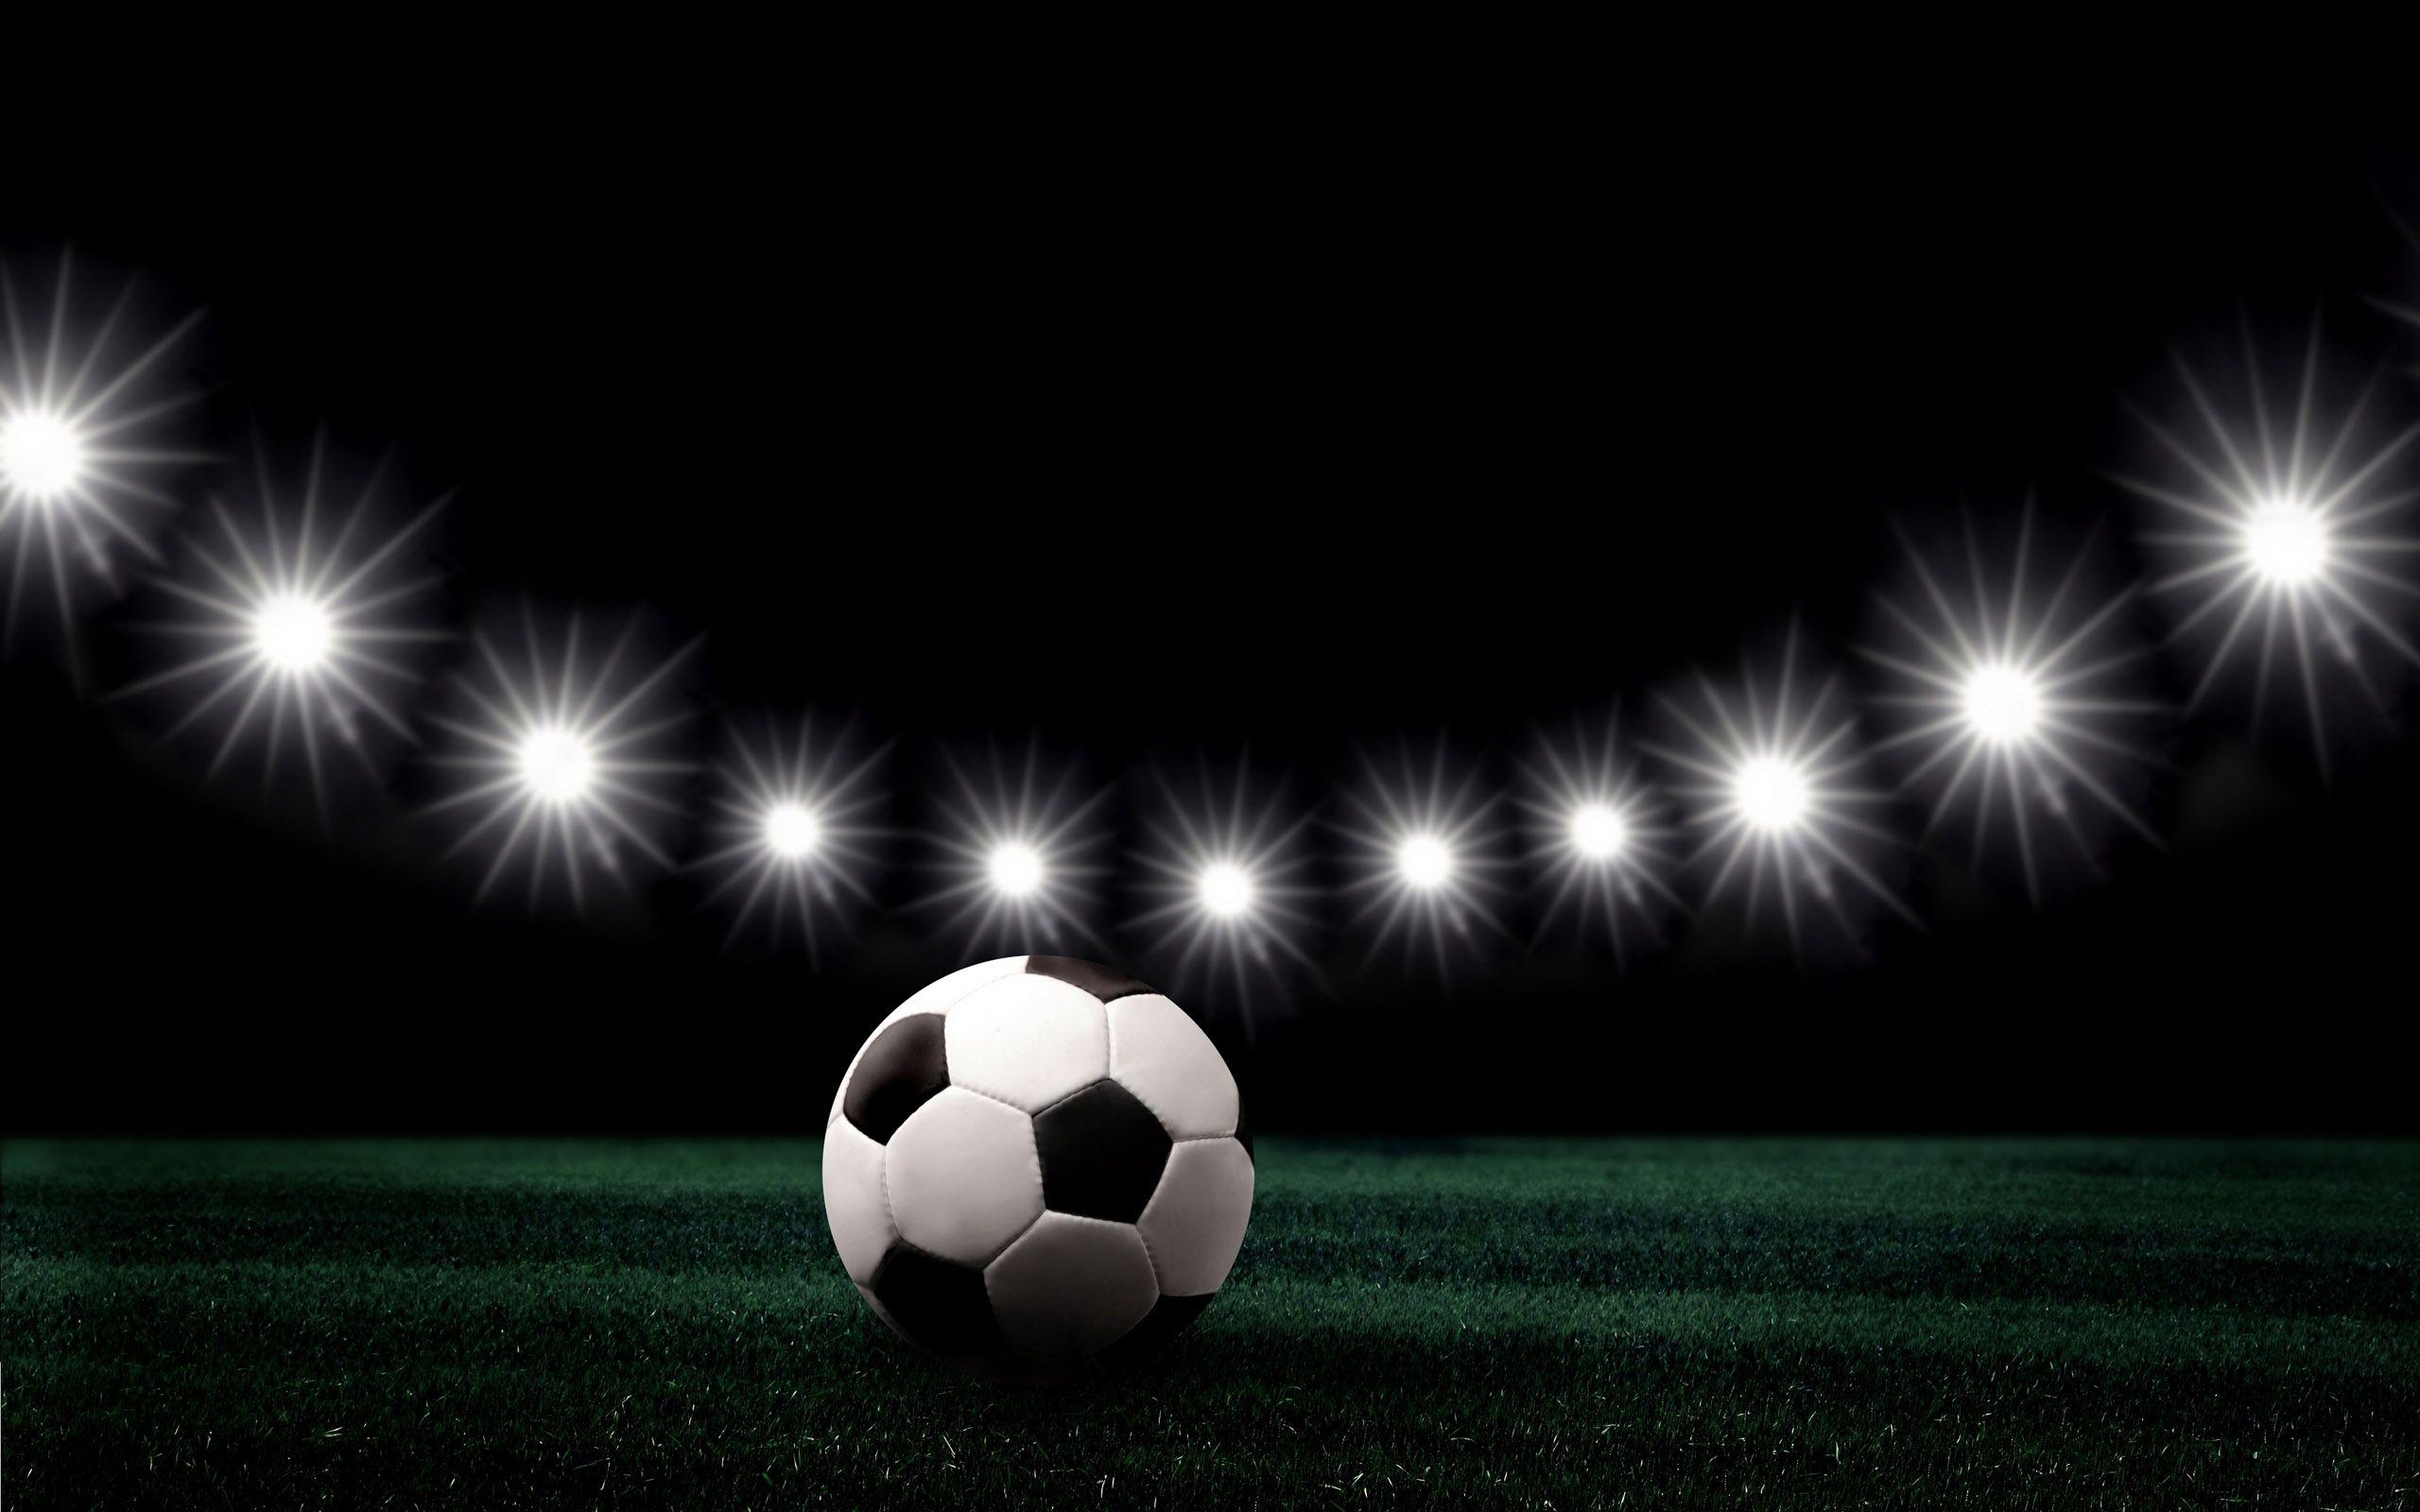 Sport football lights 1024x768 pixel PPT Backgrounds for